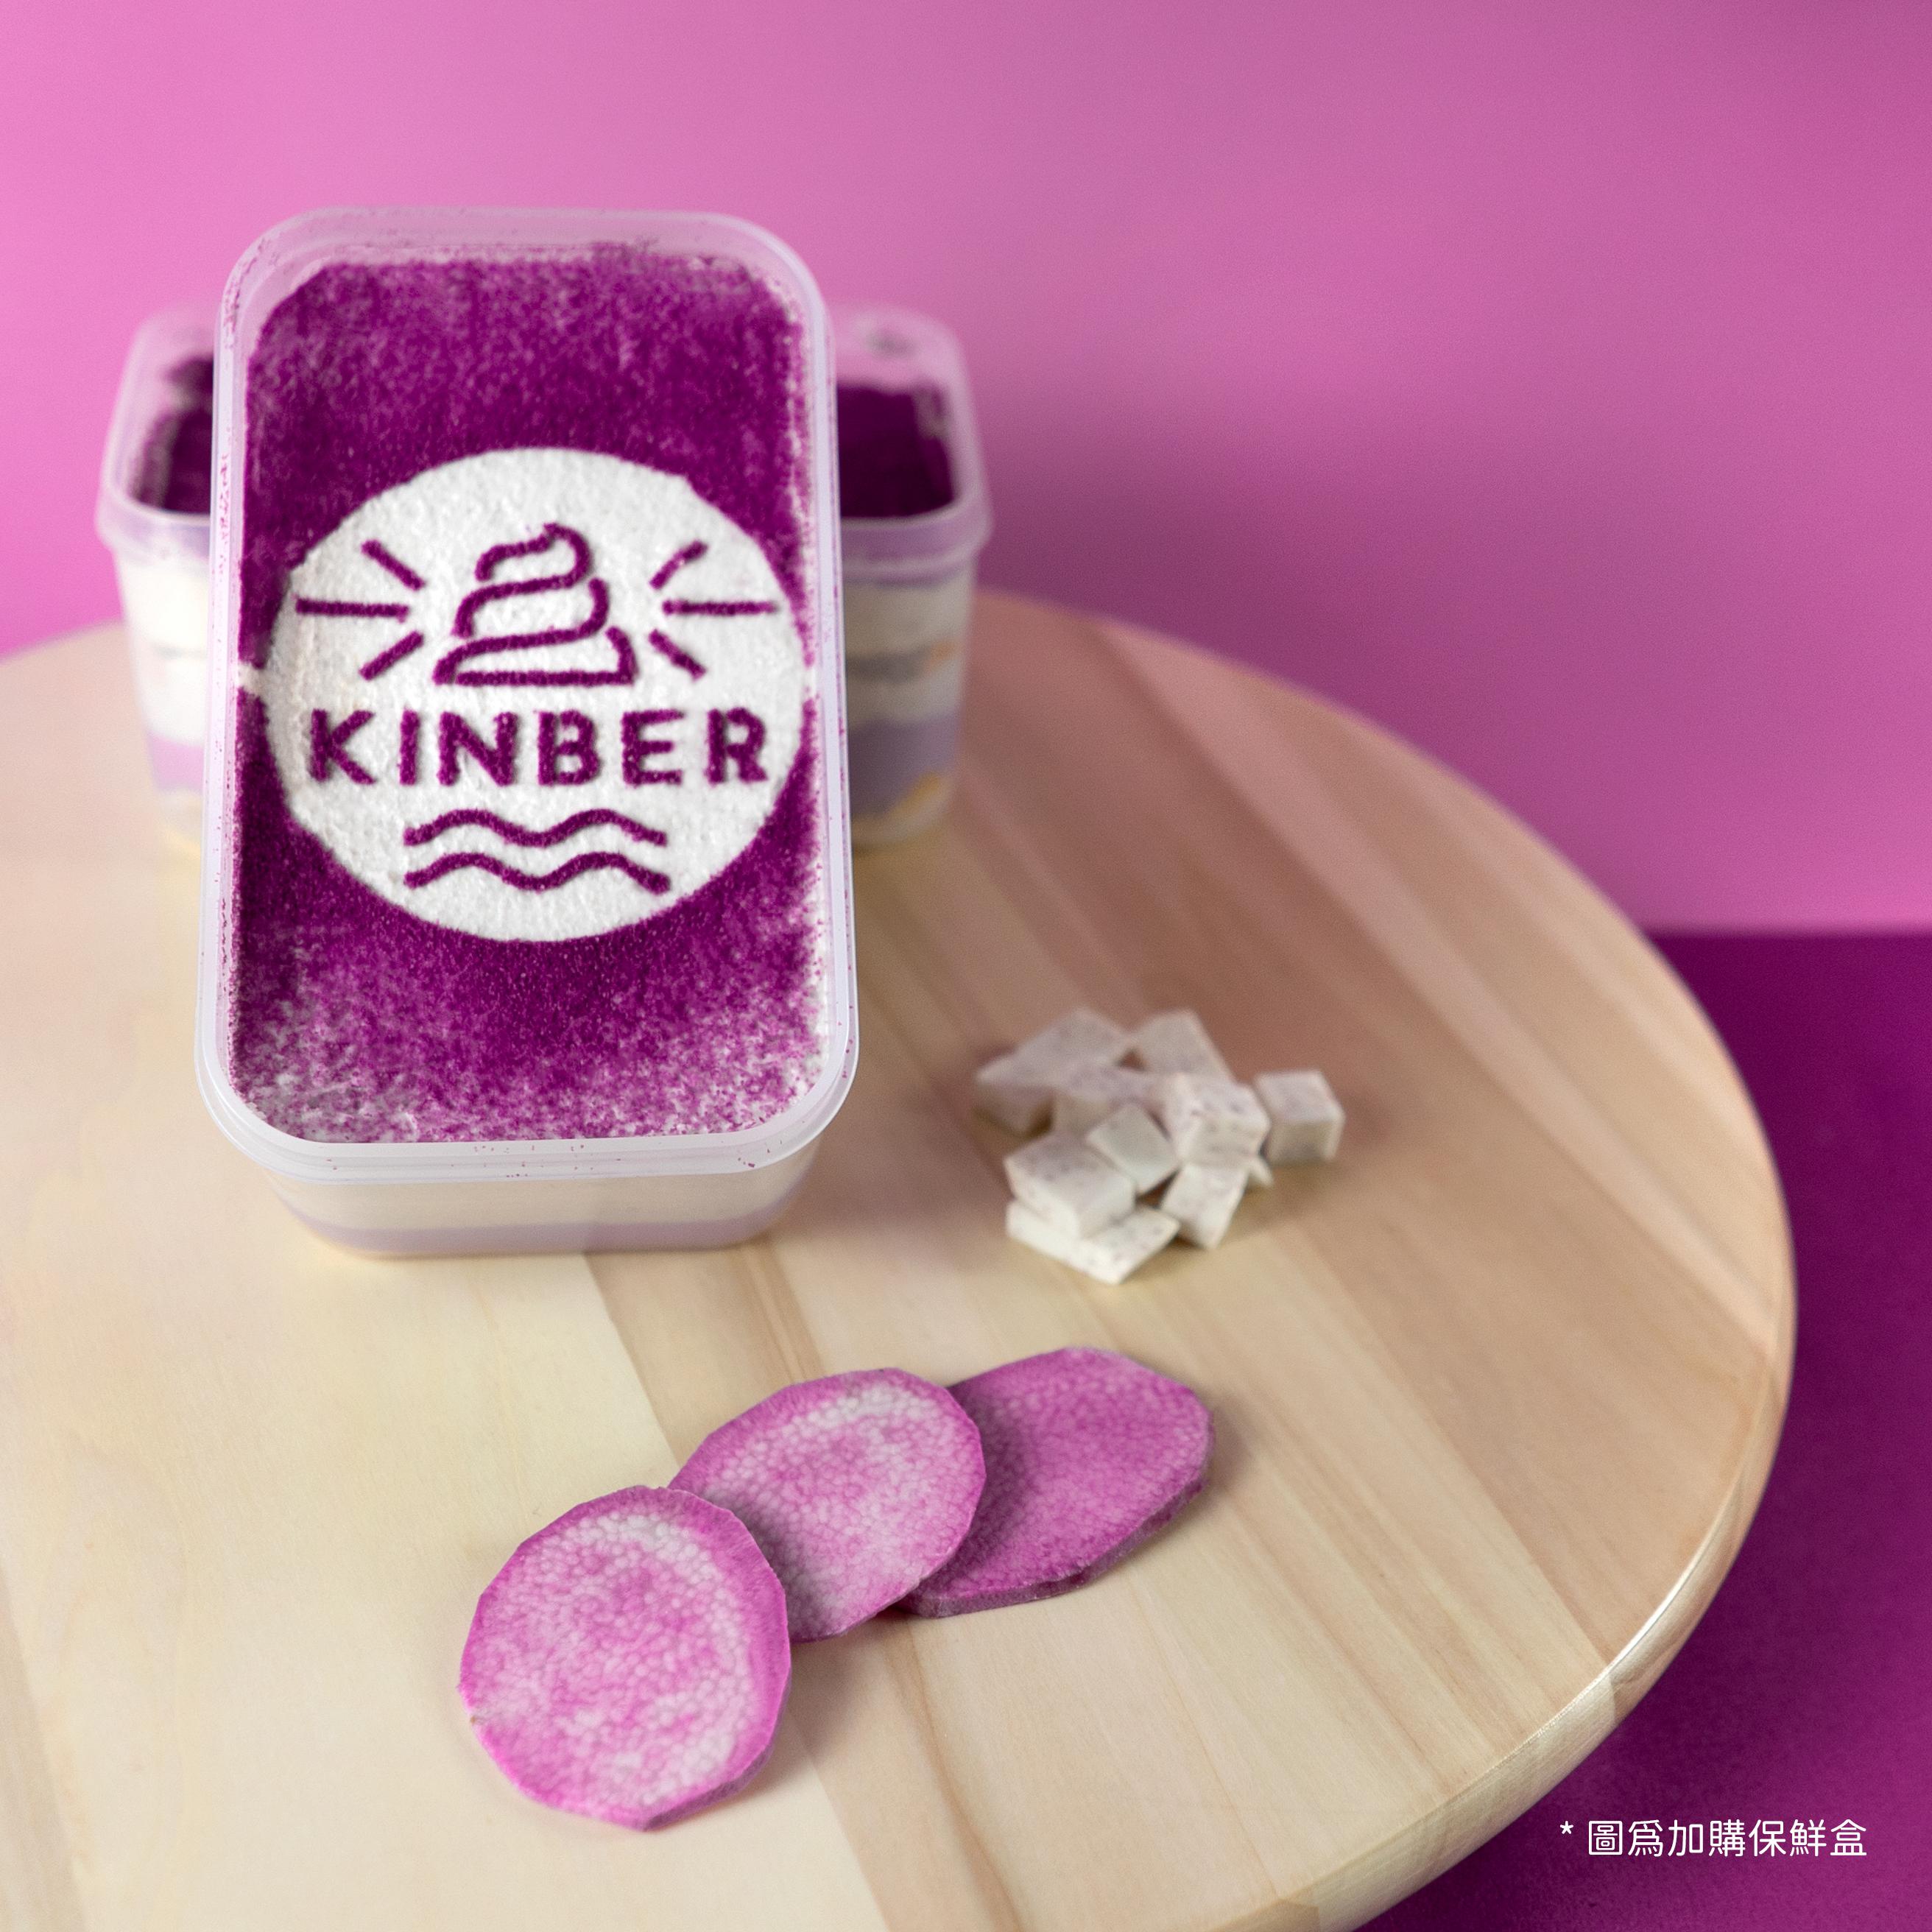 【KINBER金帛手製】芋香蛋糕盒